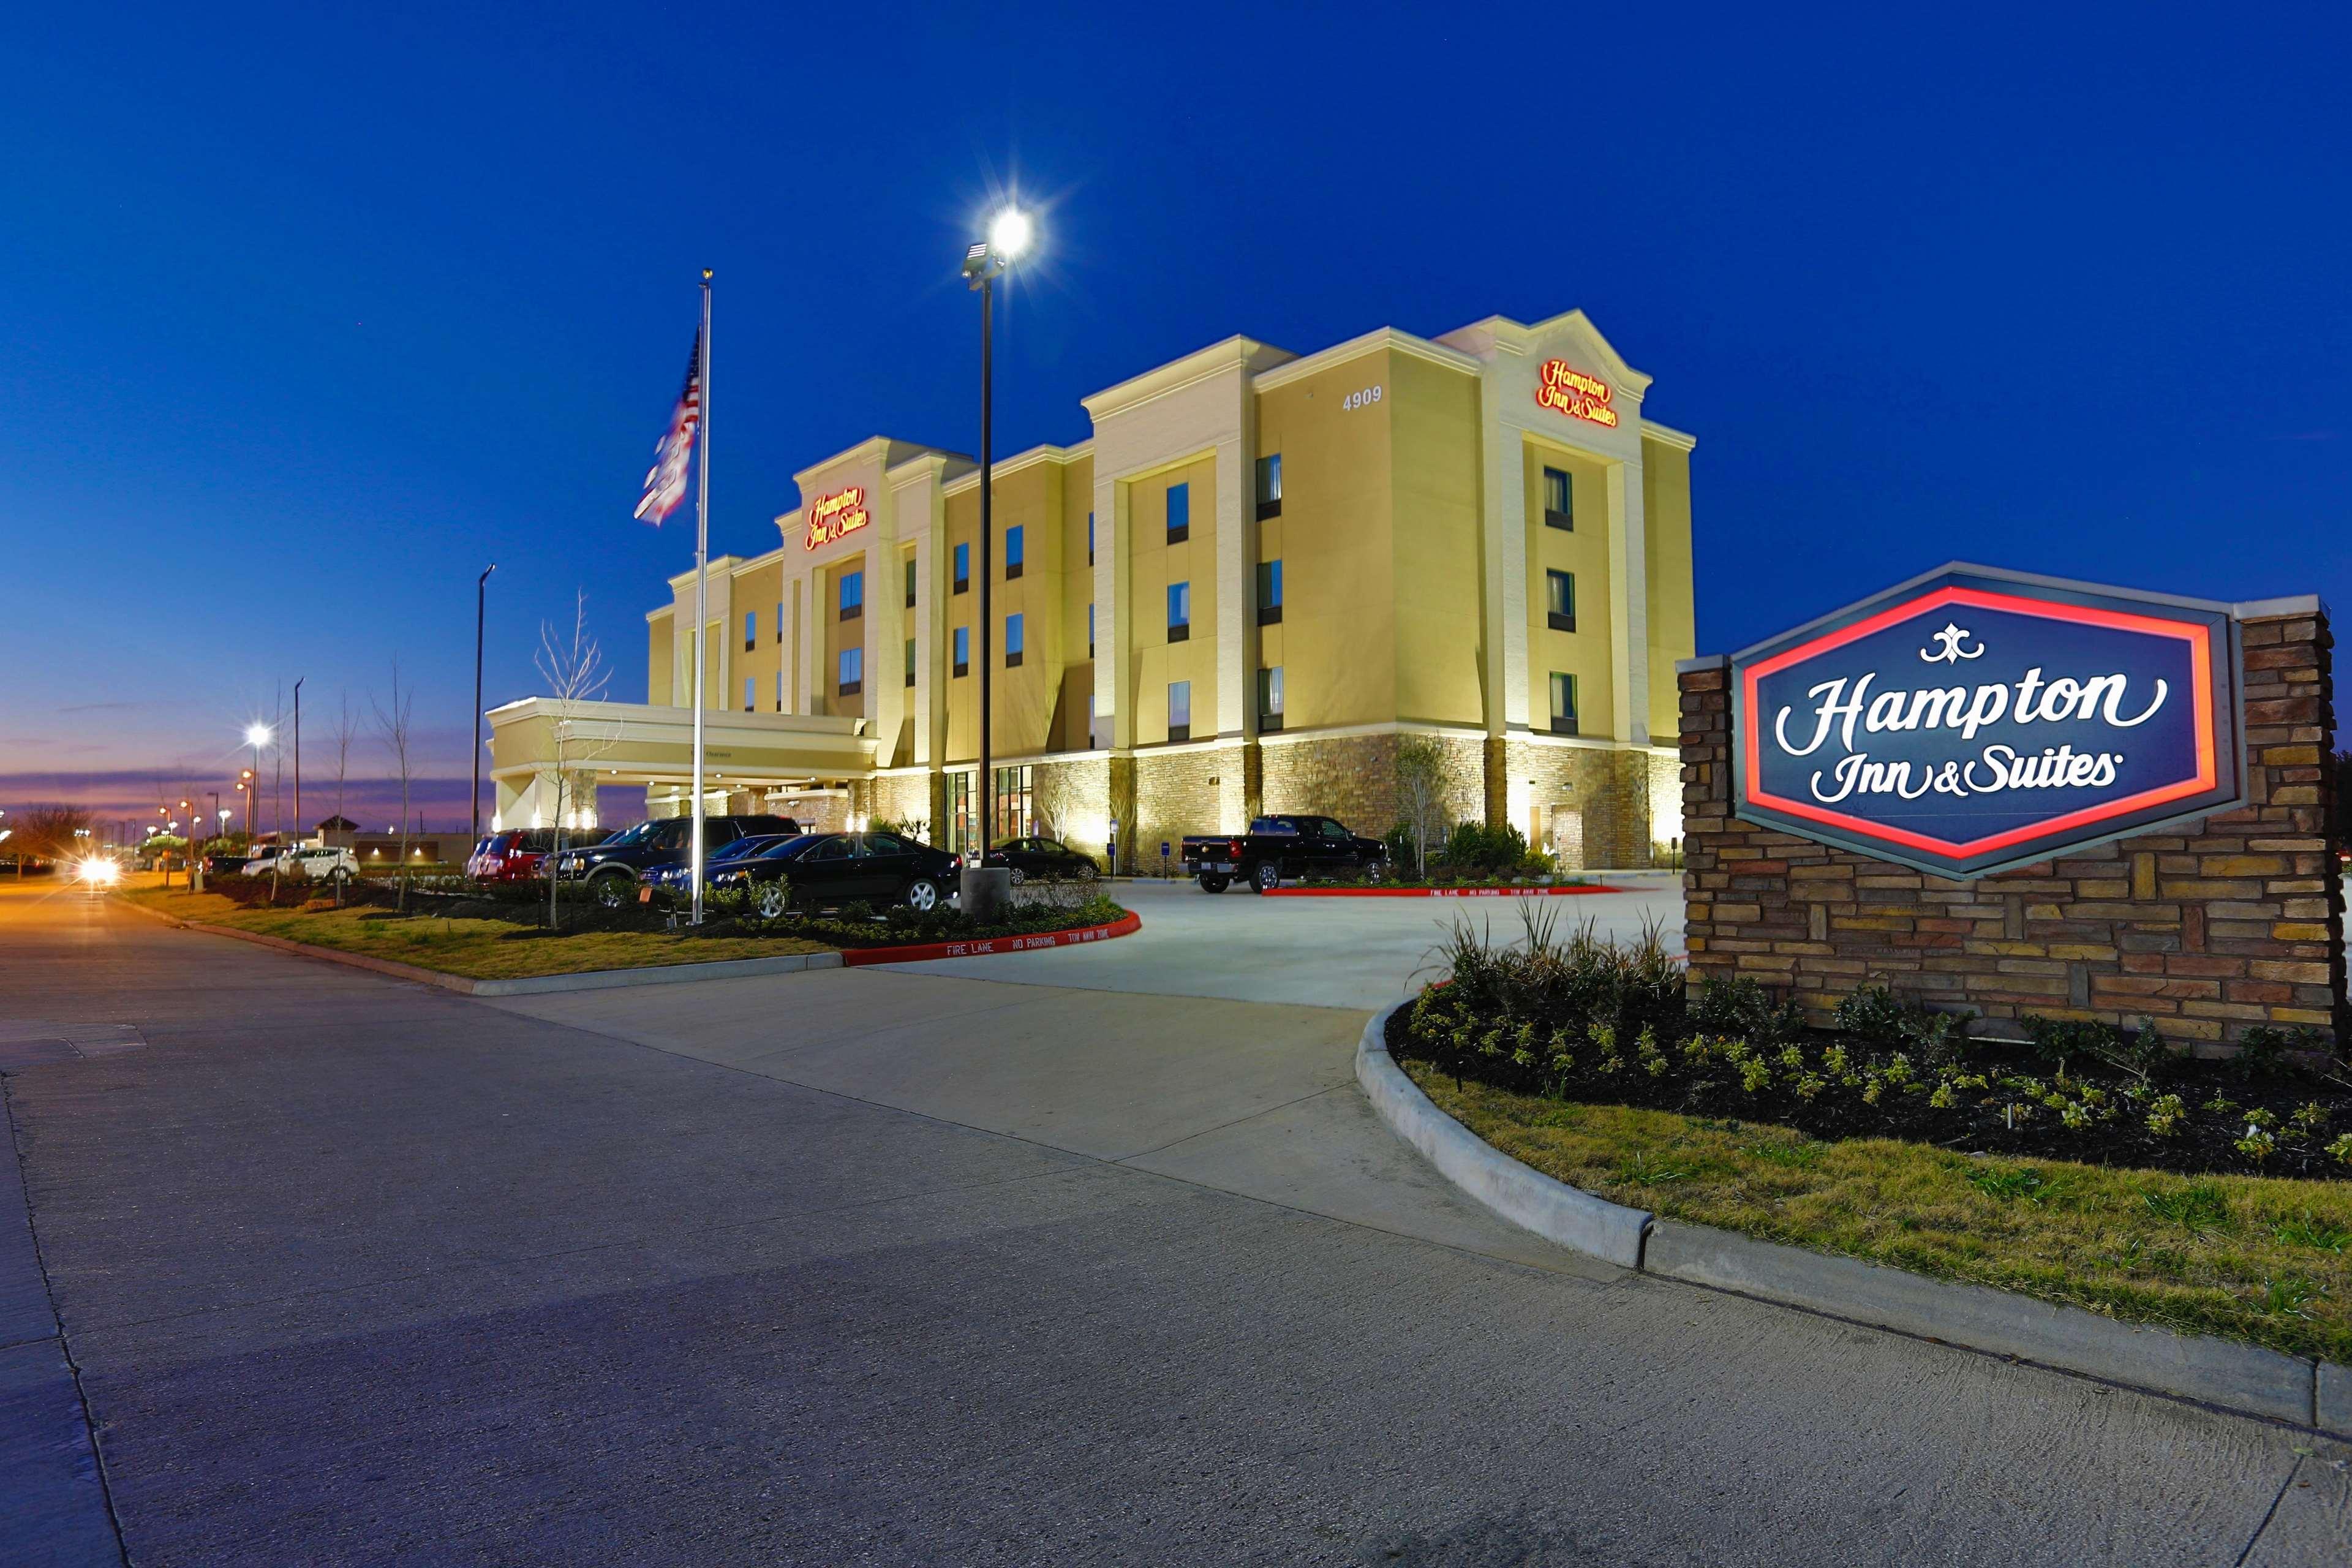 Hampton Inn & Suites Missouri City, TX image 0